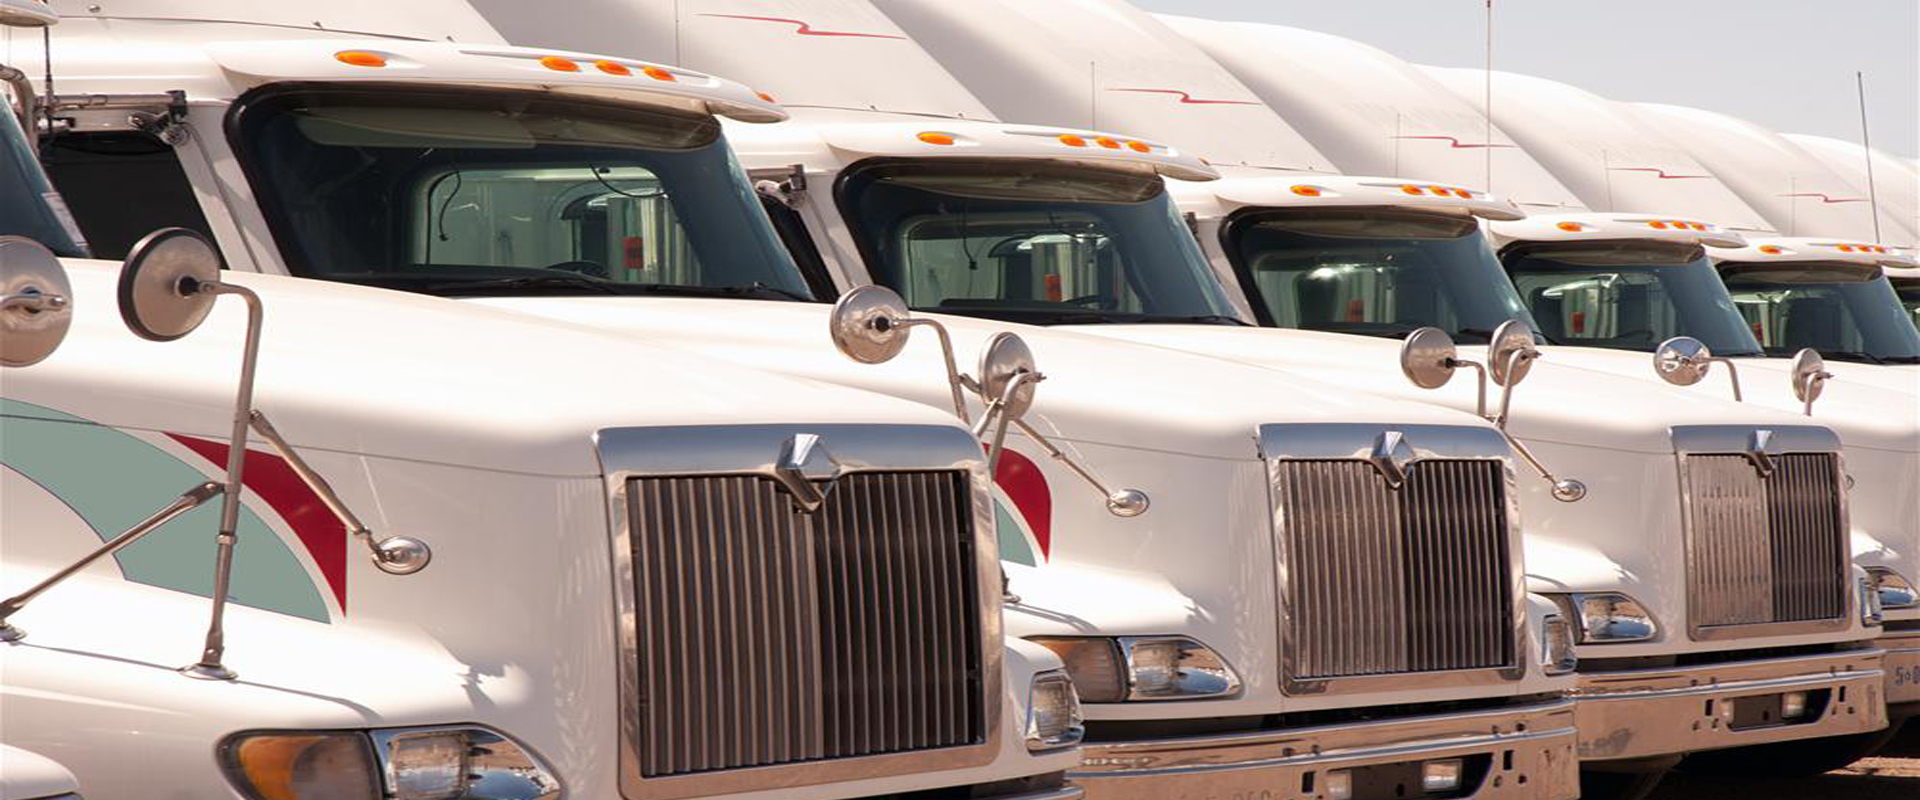 Fleet Washing For Tractor Trailers SemiTrucks St Louis MO_Slider